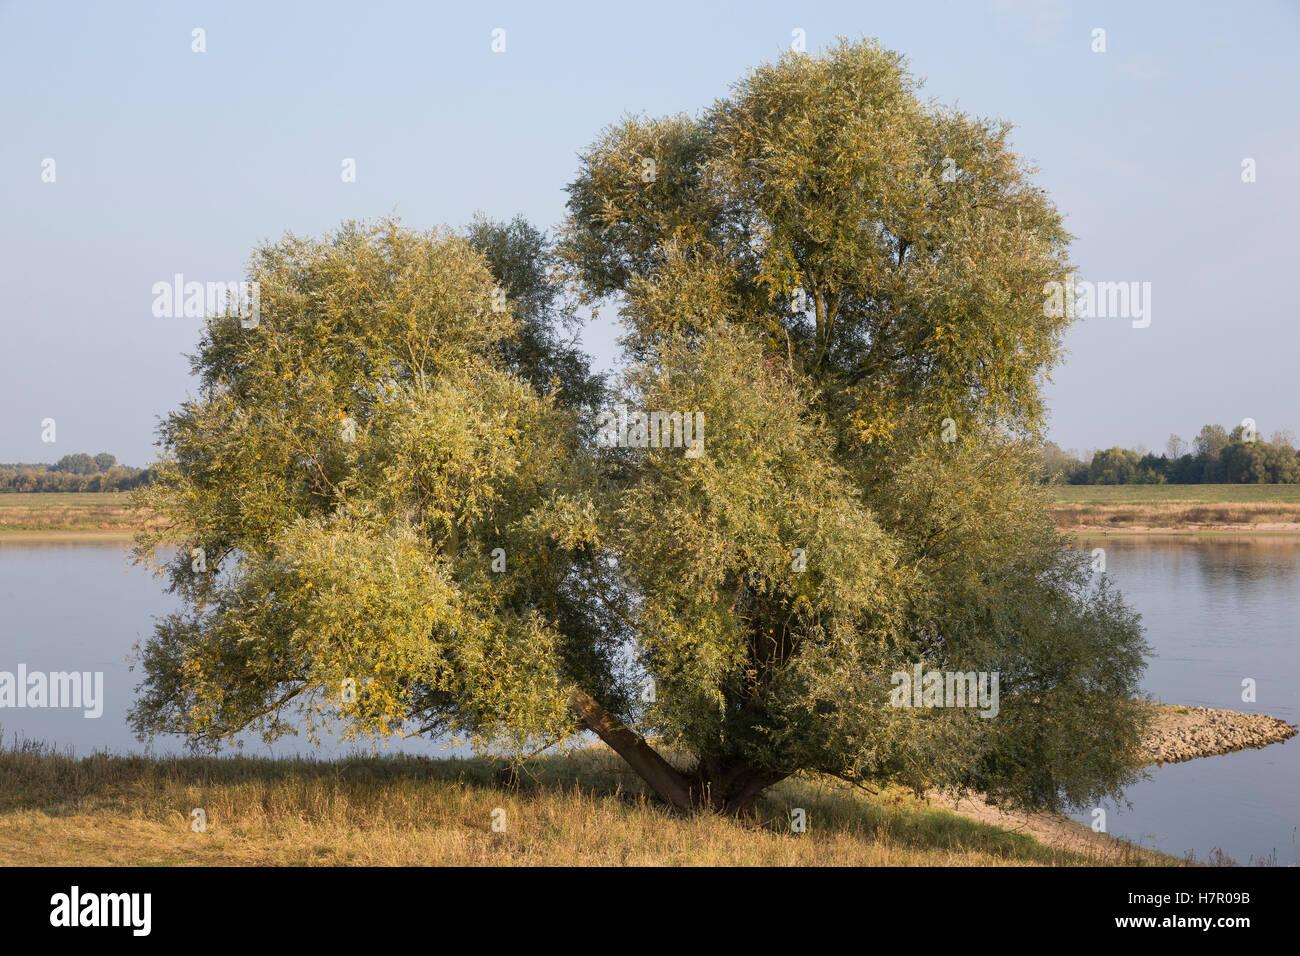 silber weide silberweide weissweide wei weide weide salix alba white willow le saule. Black Bedroom Furniture Sets. Home Design Ideas